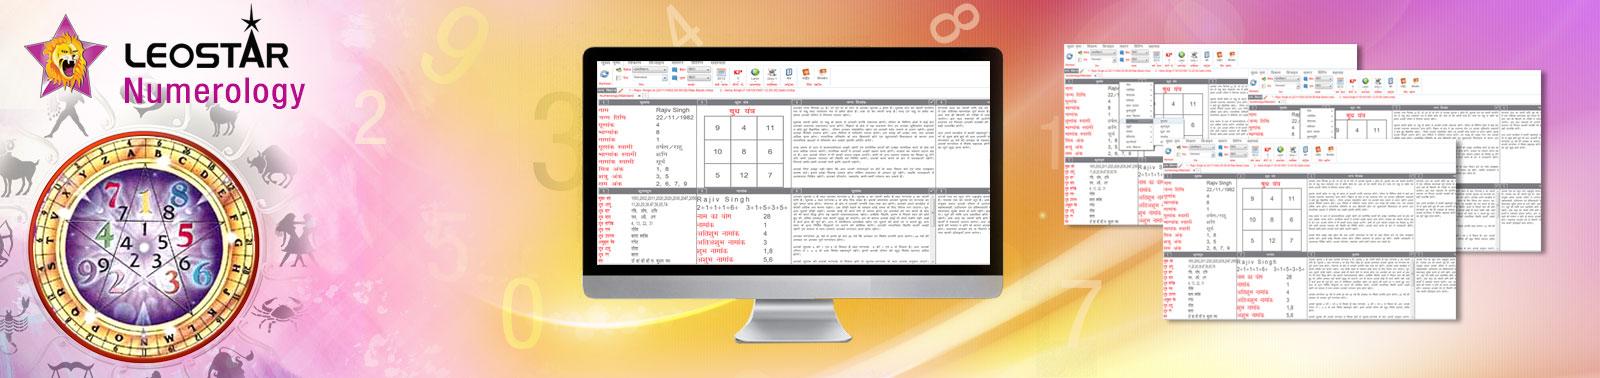 Leostar Numerology is best software in field of astrology